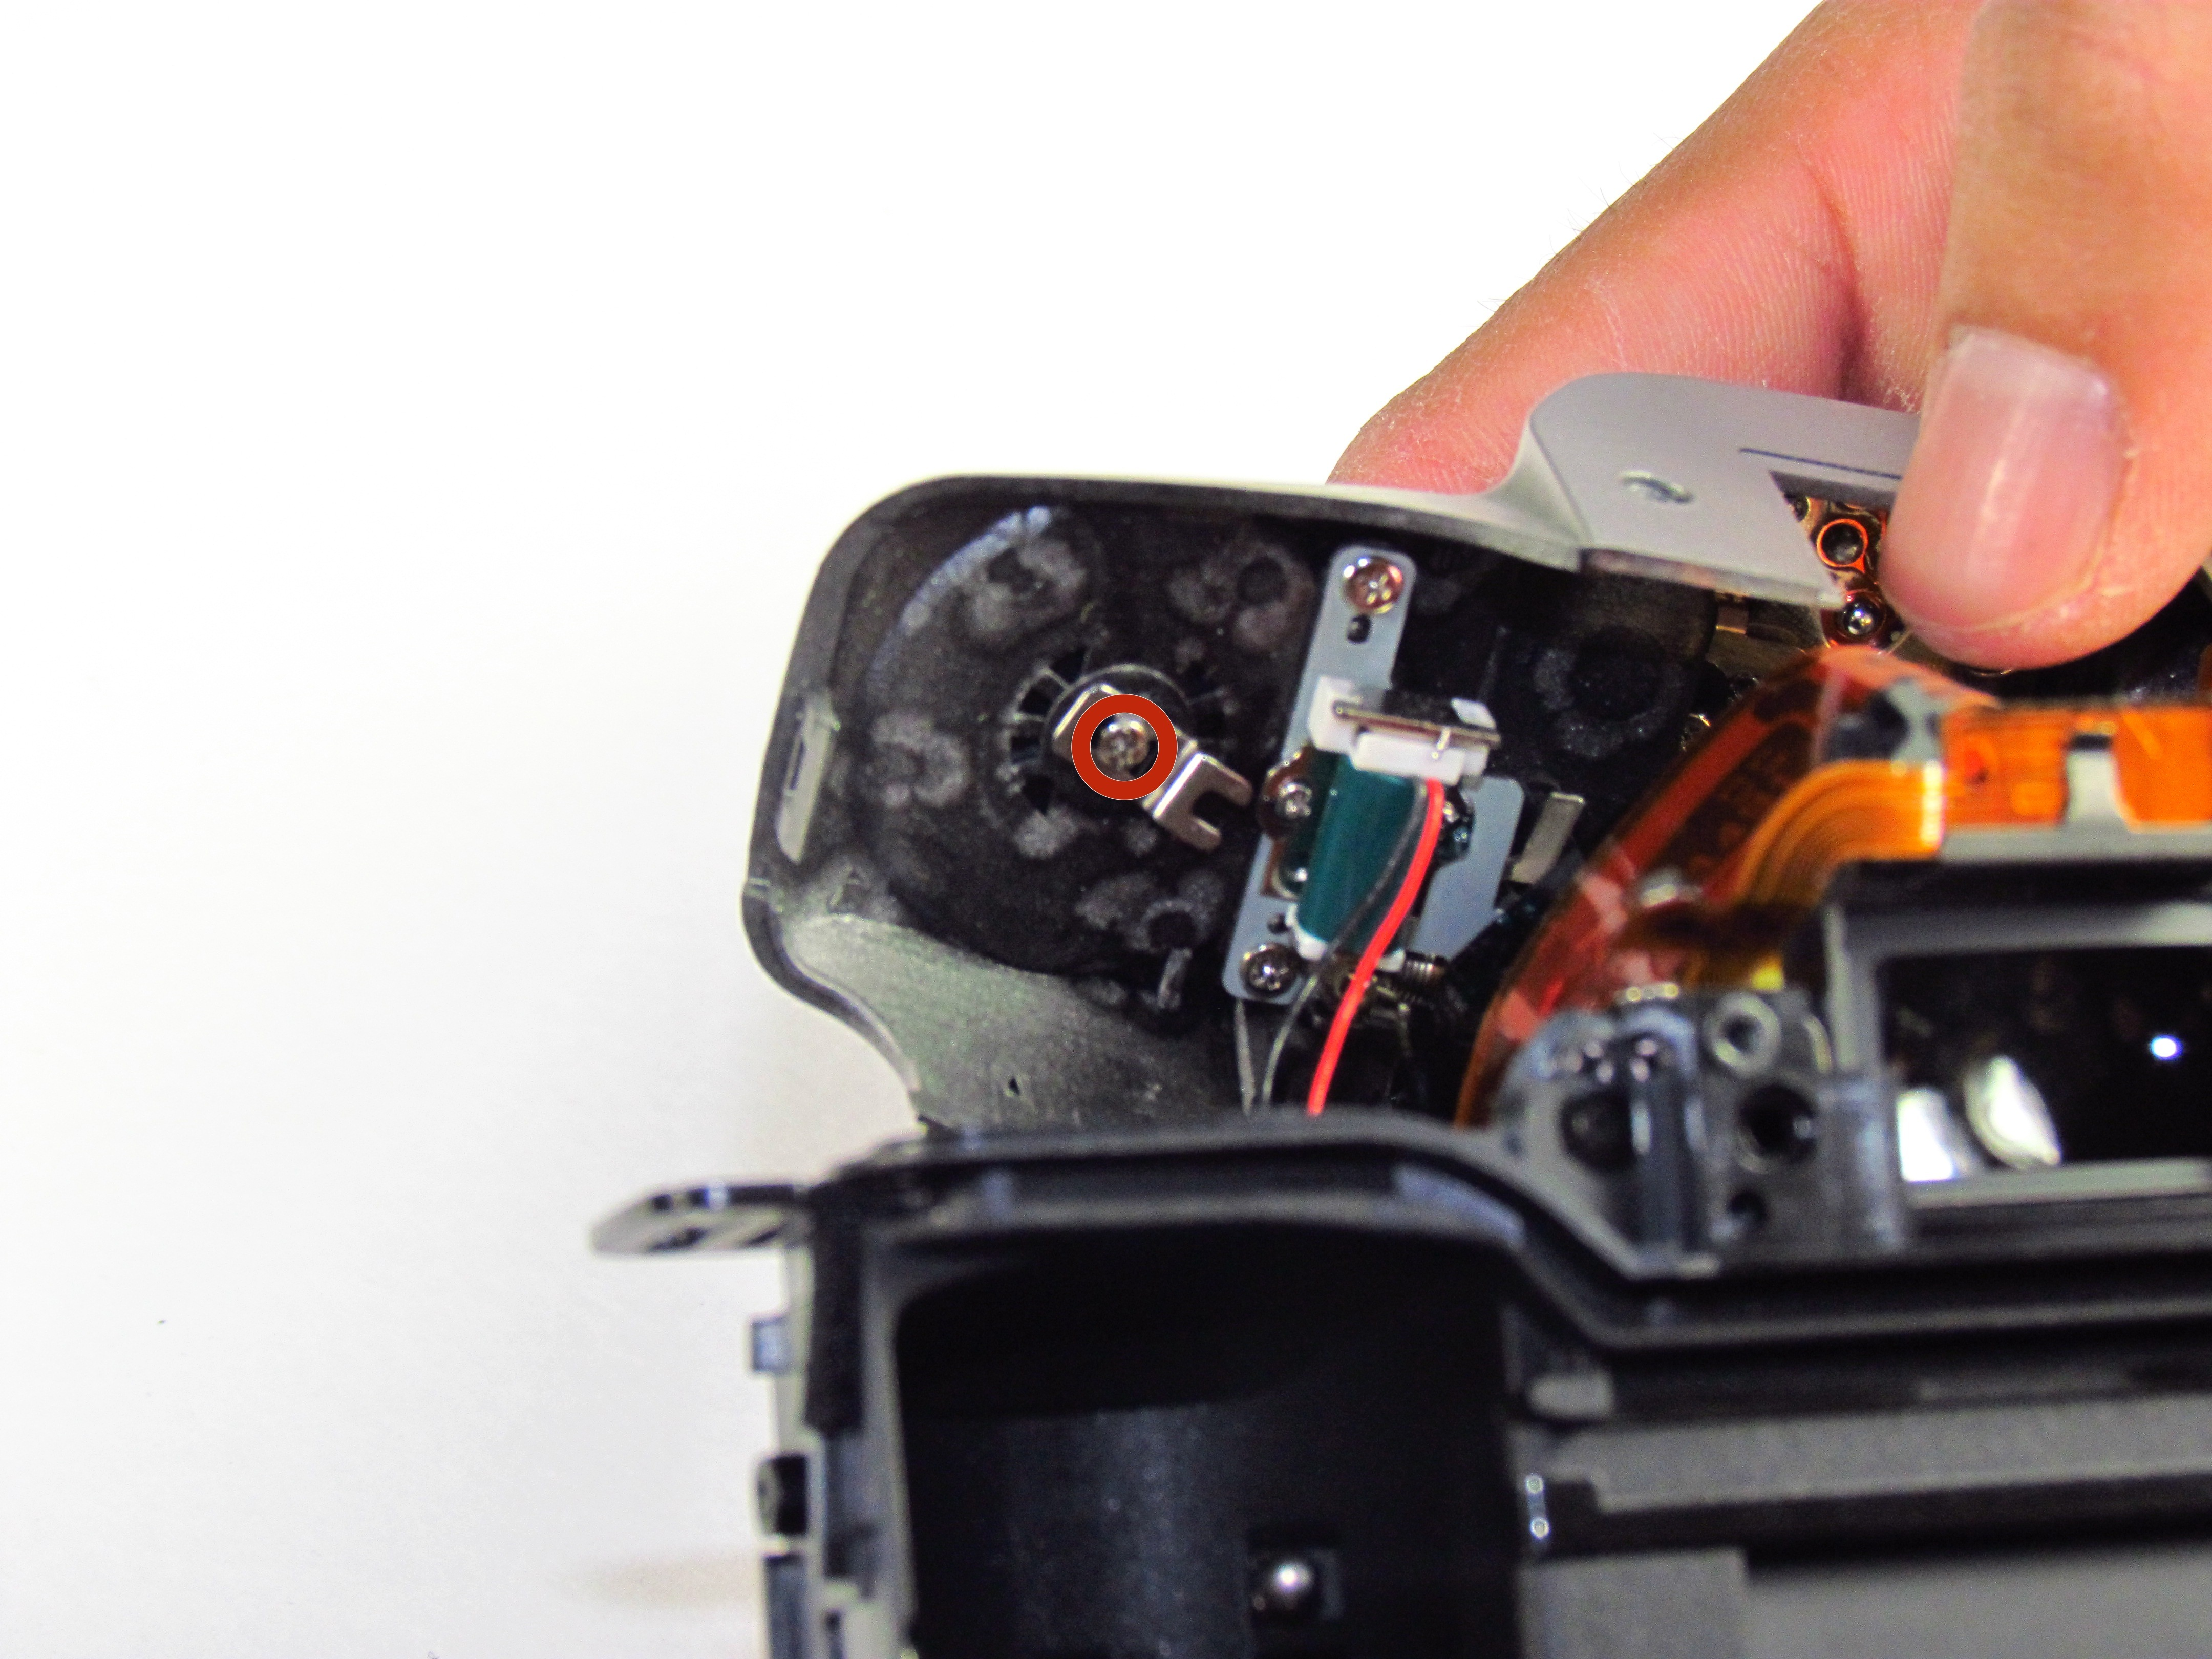 canon eos 300 repair ifixit rh ifixit com Canon 70D Canon T3i